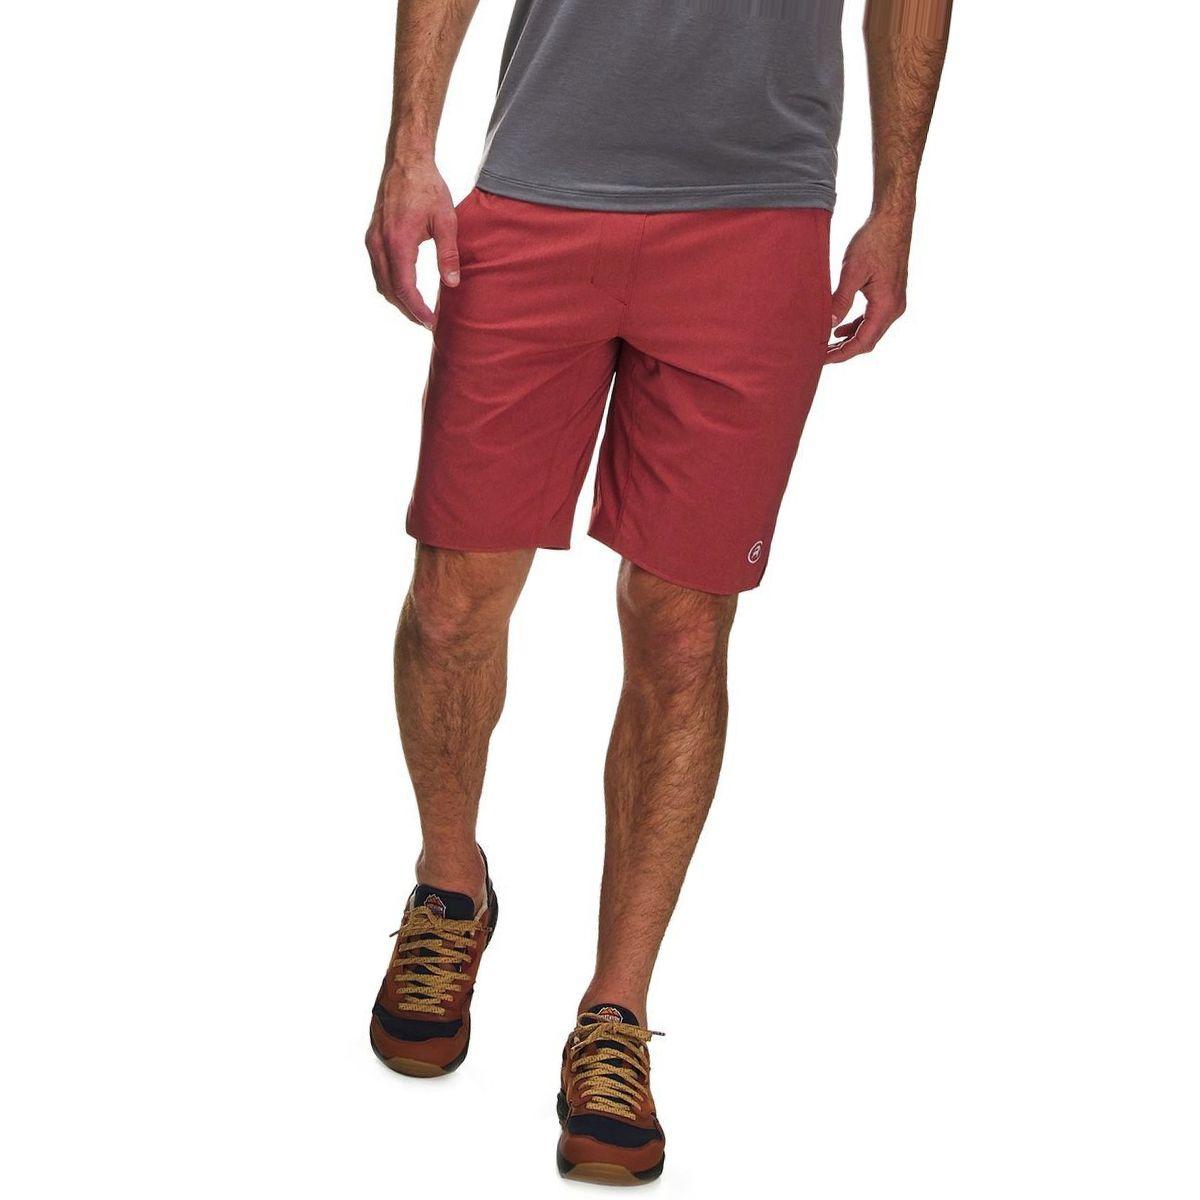 Backcountry Olympus Lightweight Short - Men's